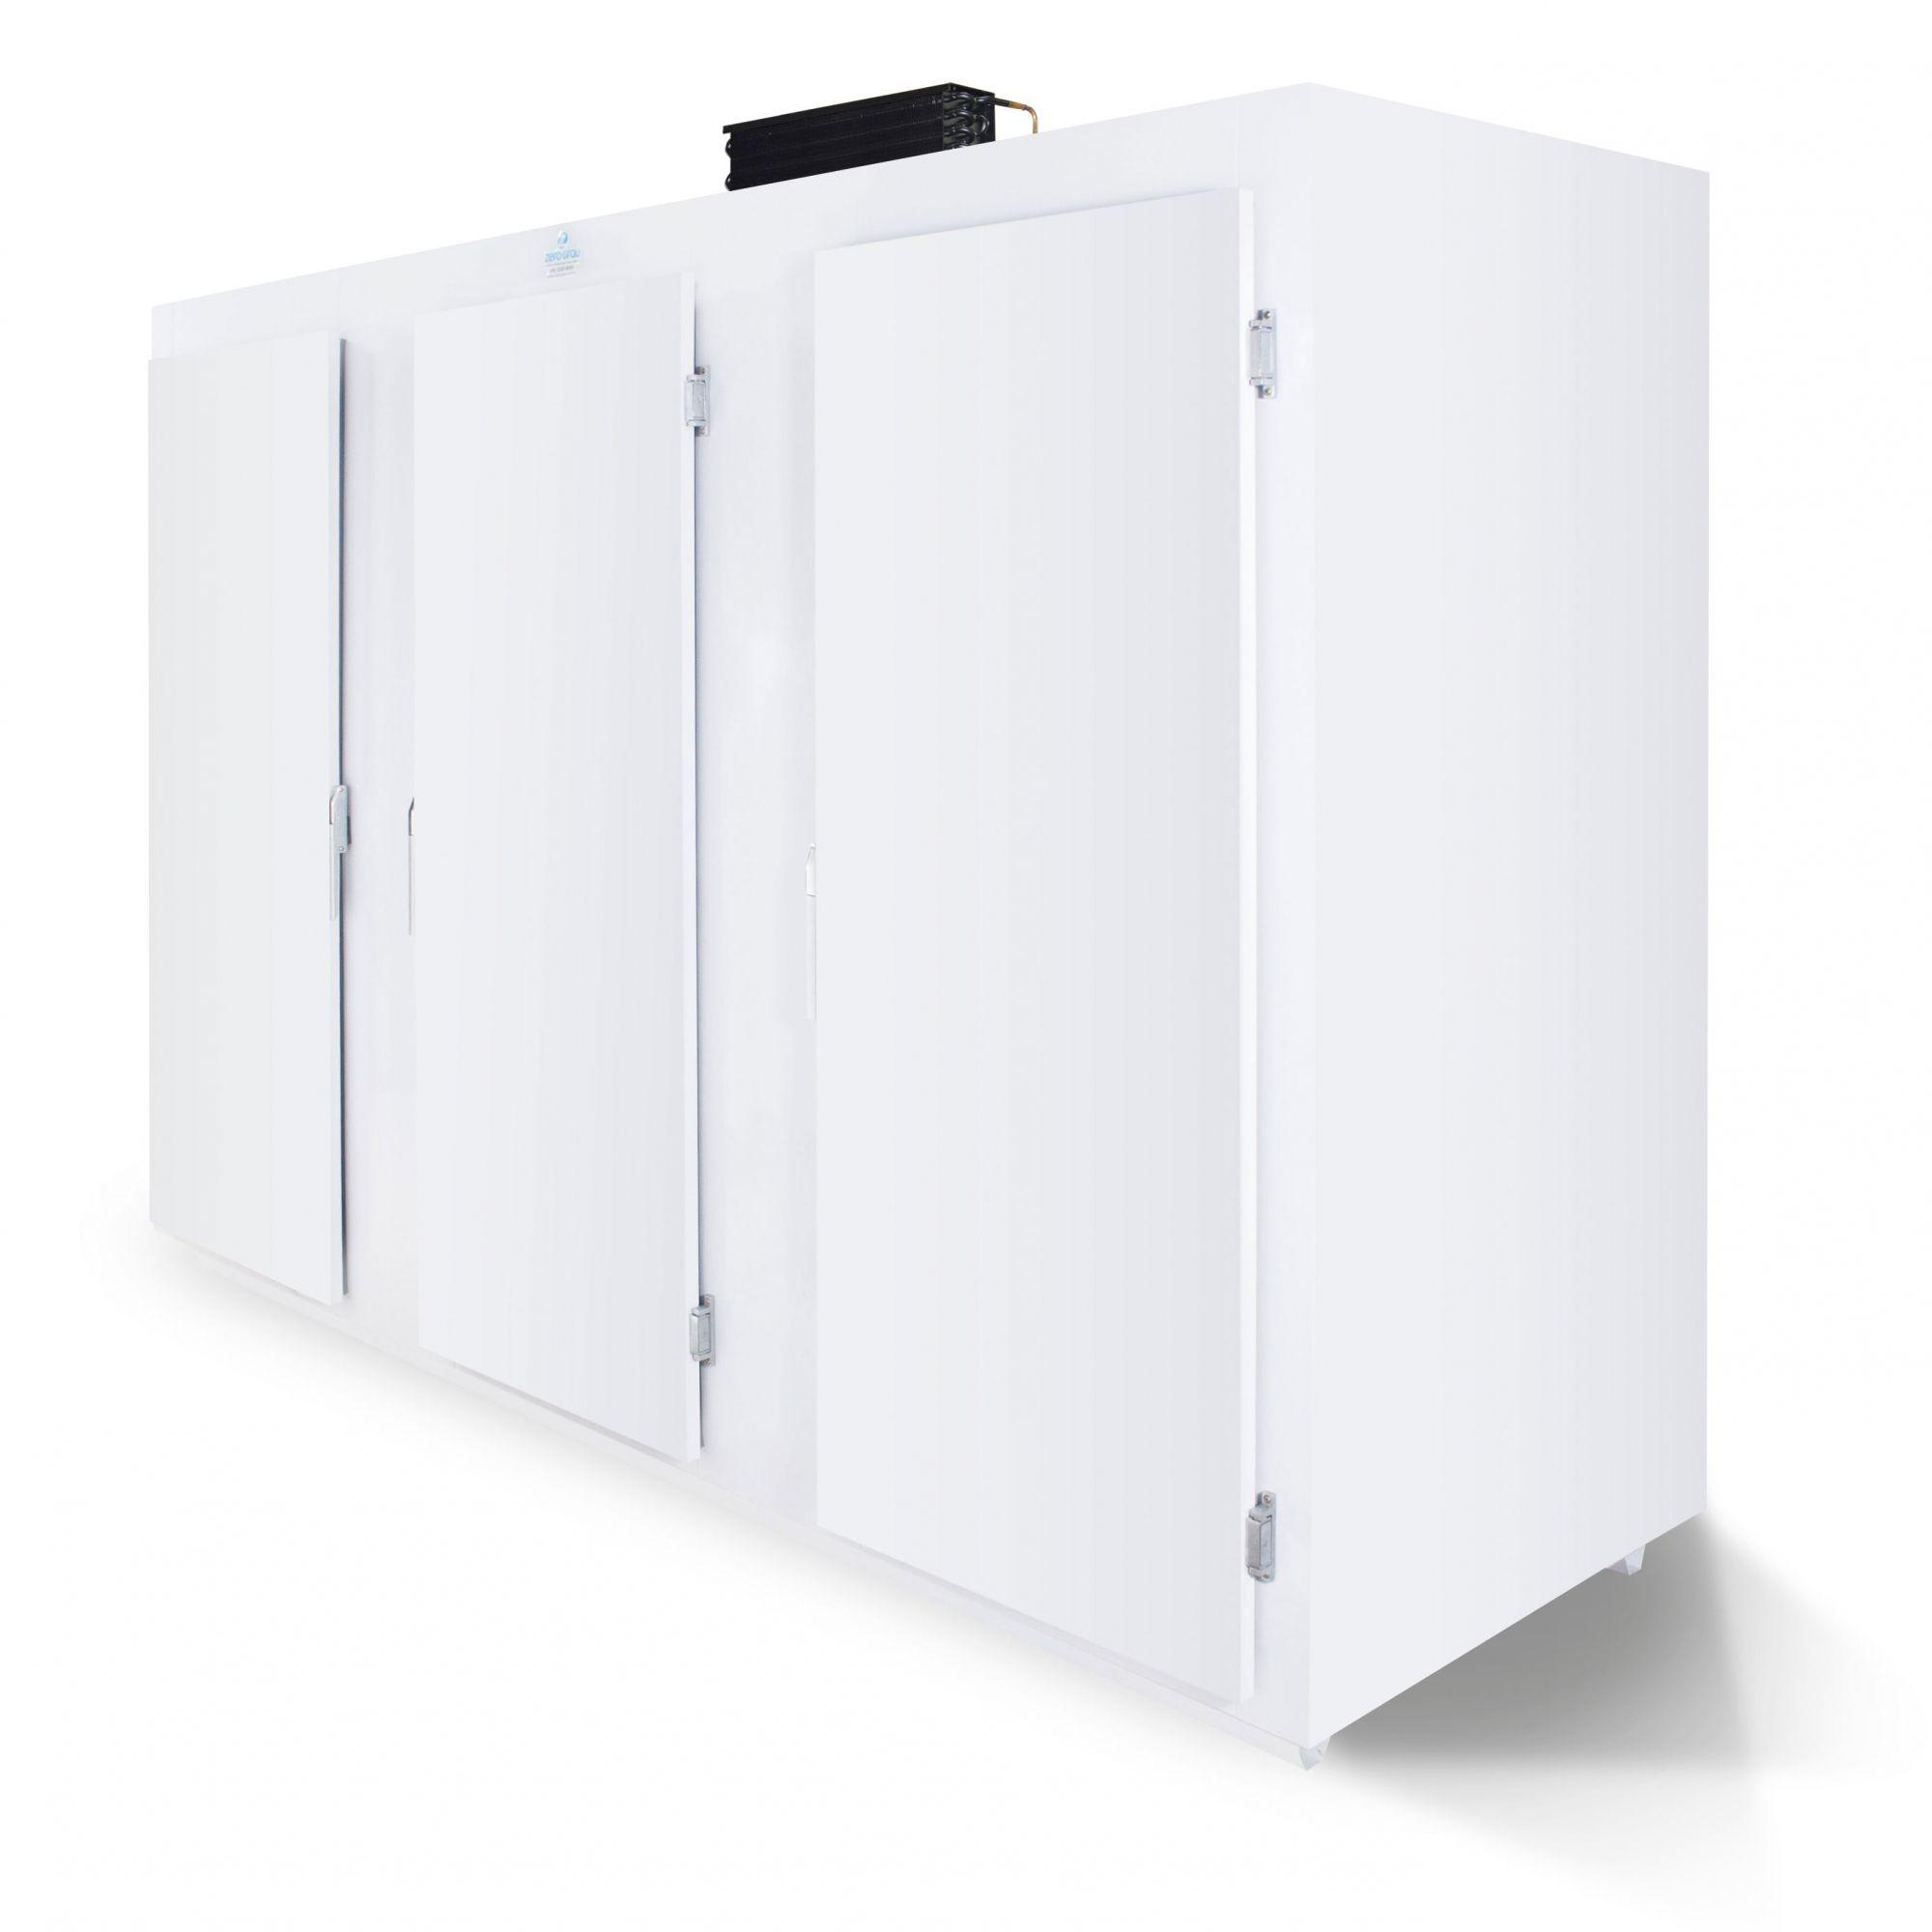 Conservador 4460 Litros 3 Portas para Gelo  - Zero Grau Store